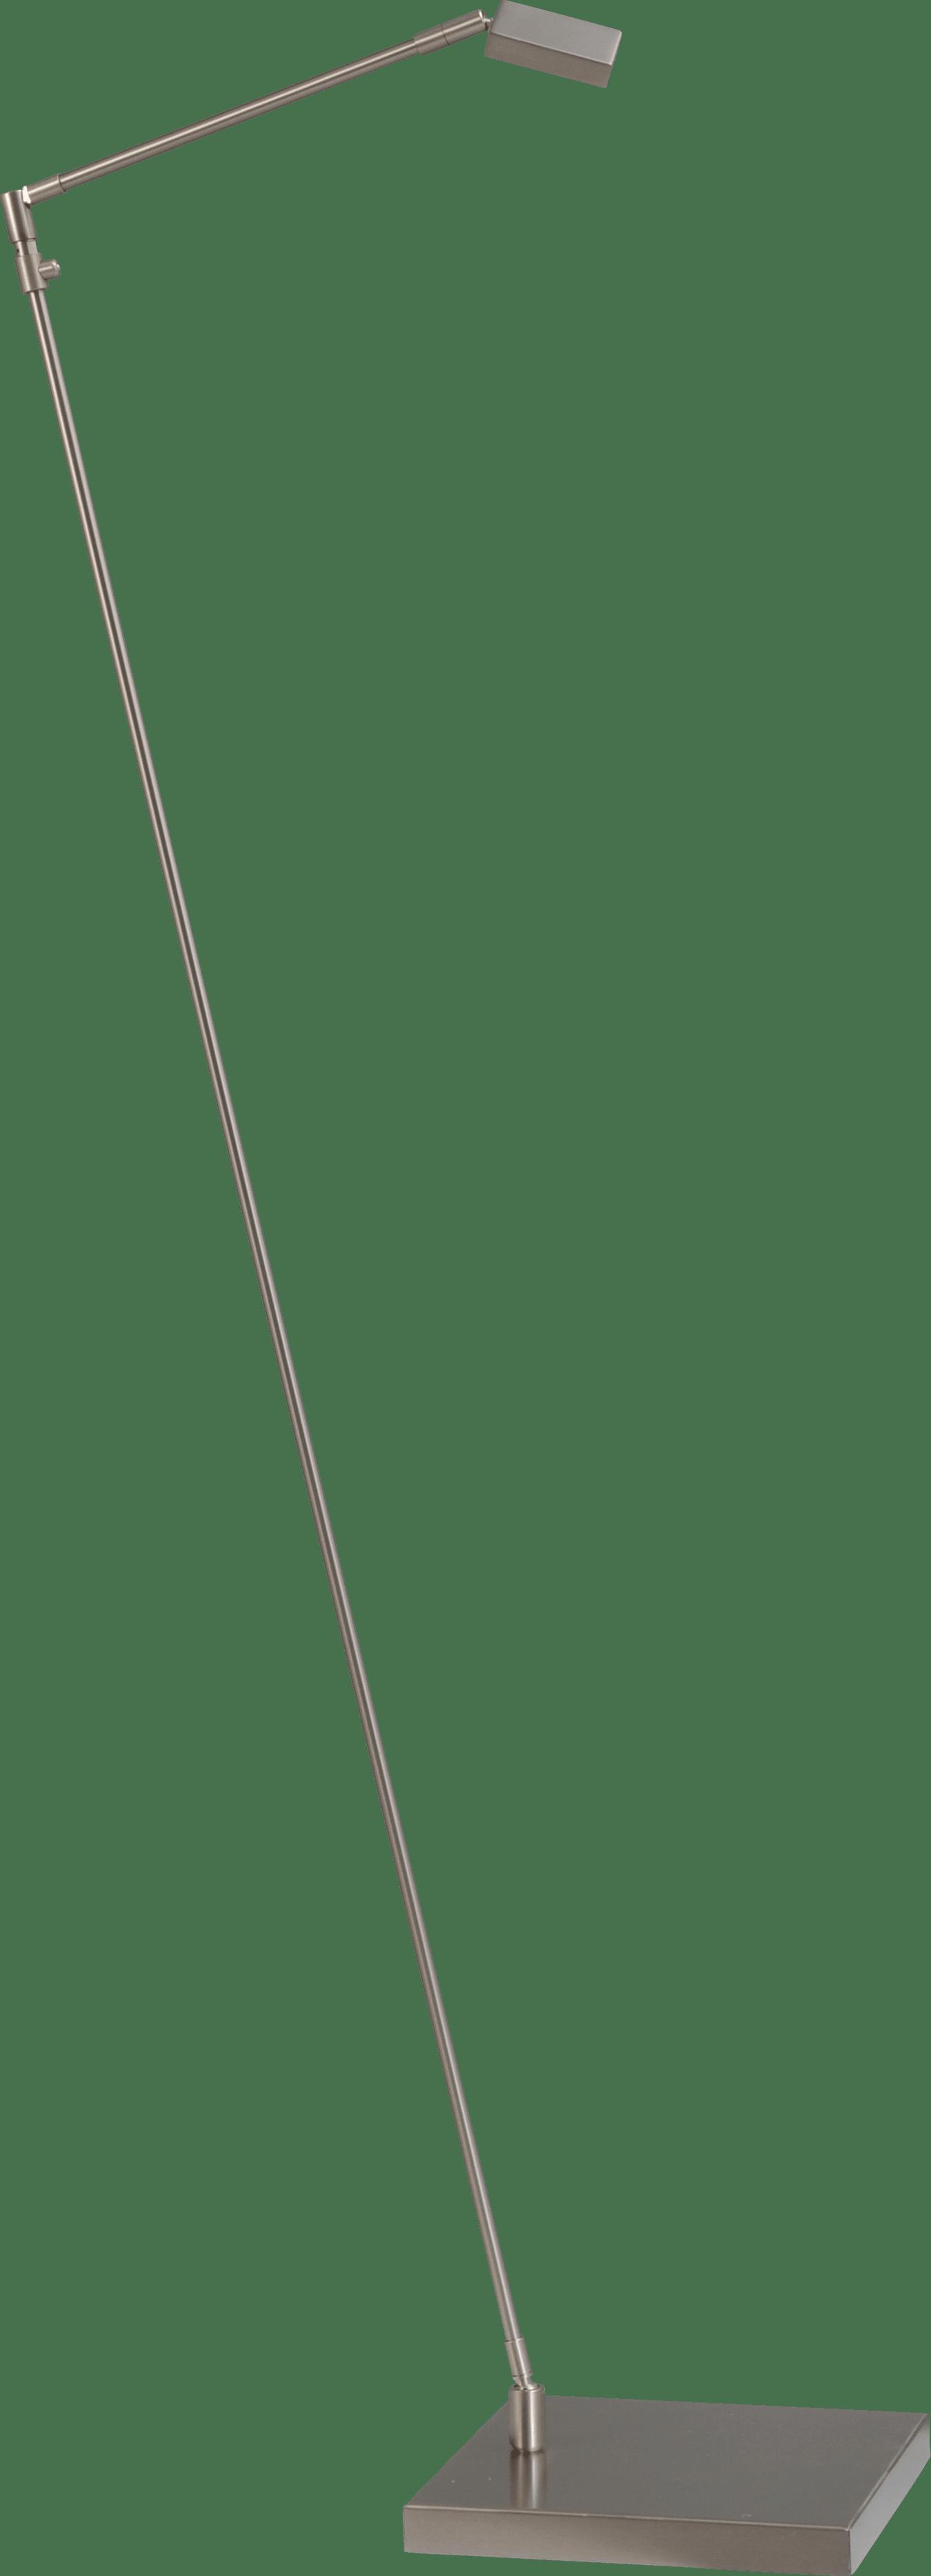 Denia 1 VL DENIA 1 NIKKEL ZWENK LEESLAMP H.130CM